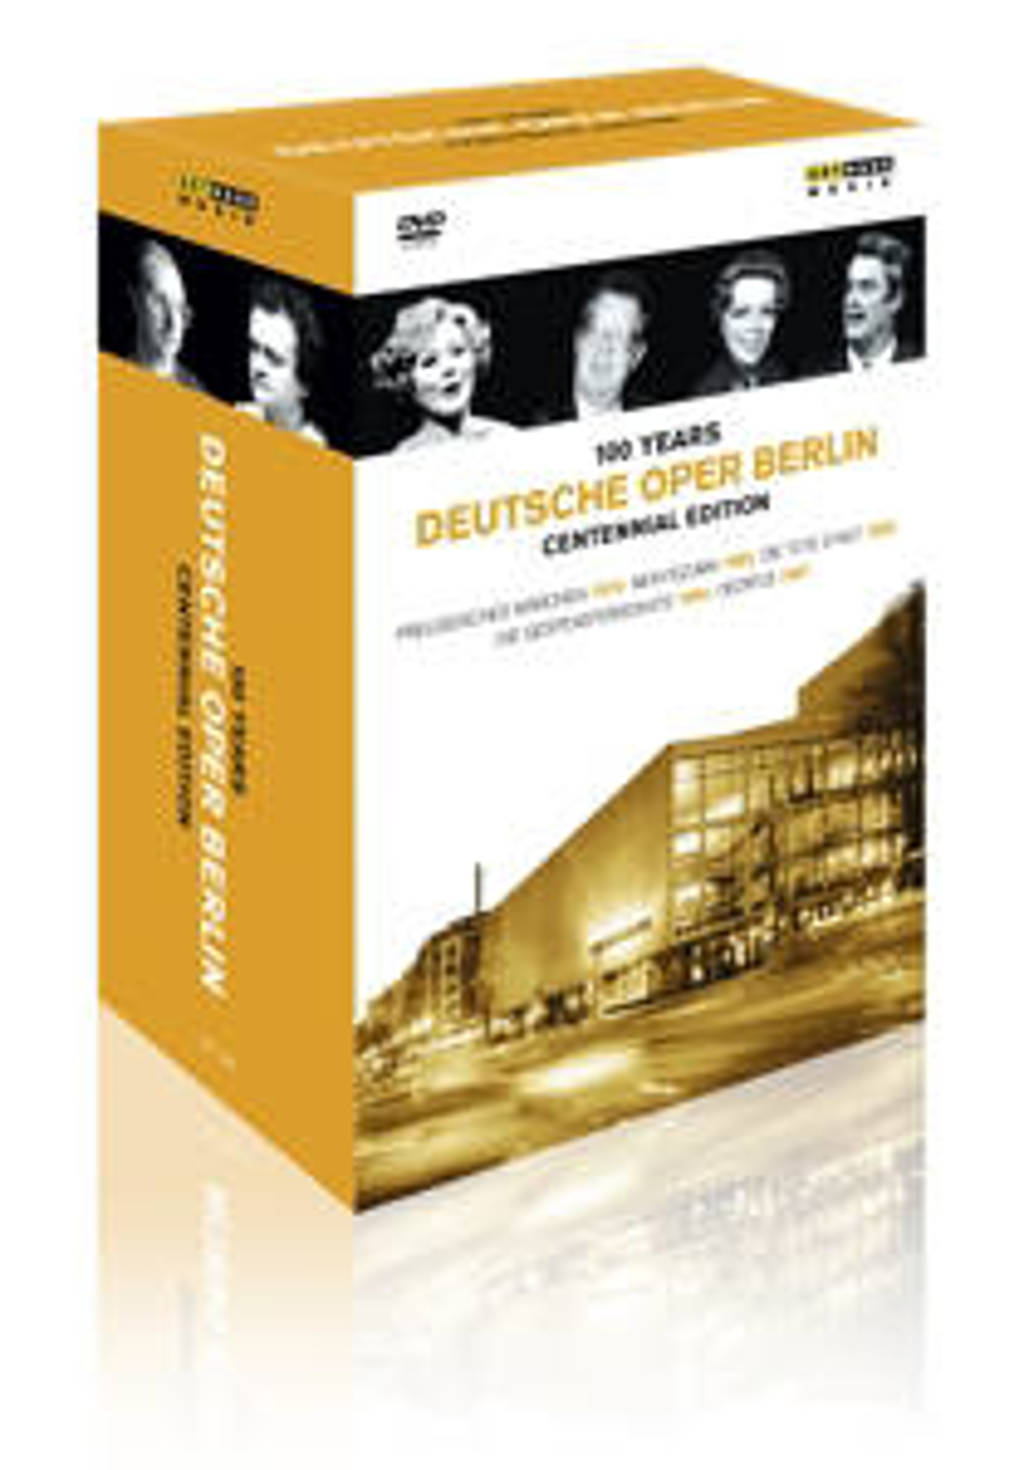 Otto,Sardi,Papadjiakou - 100 Jaar Deutsche Oper Berlin (DVD)